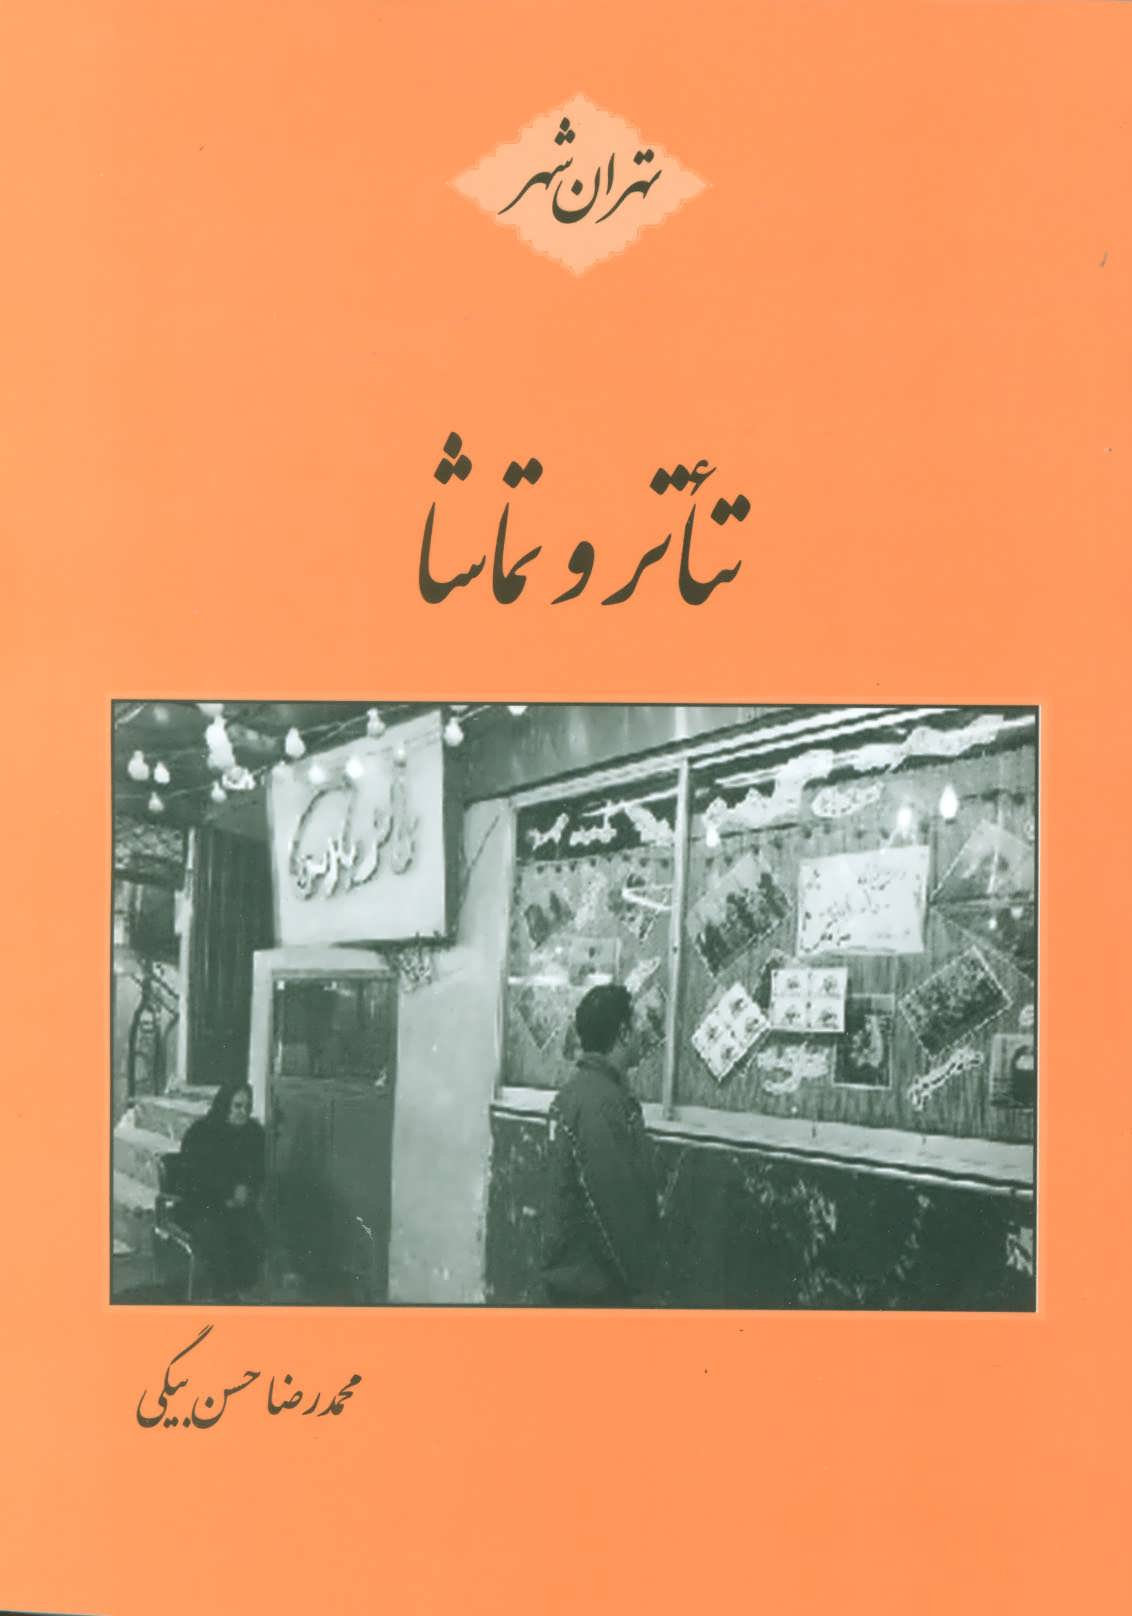 تئاتر و تماشا (تهران شهر)